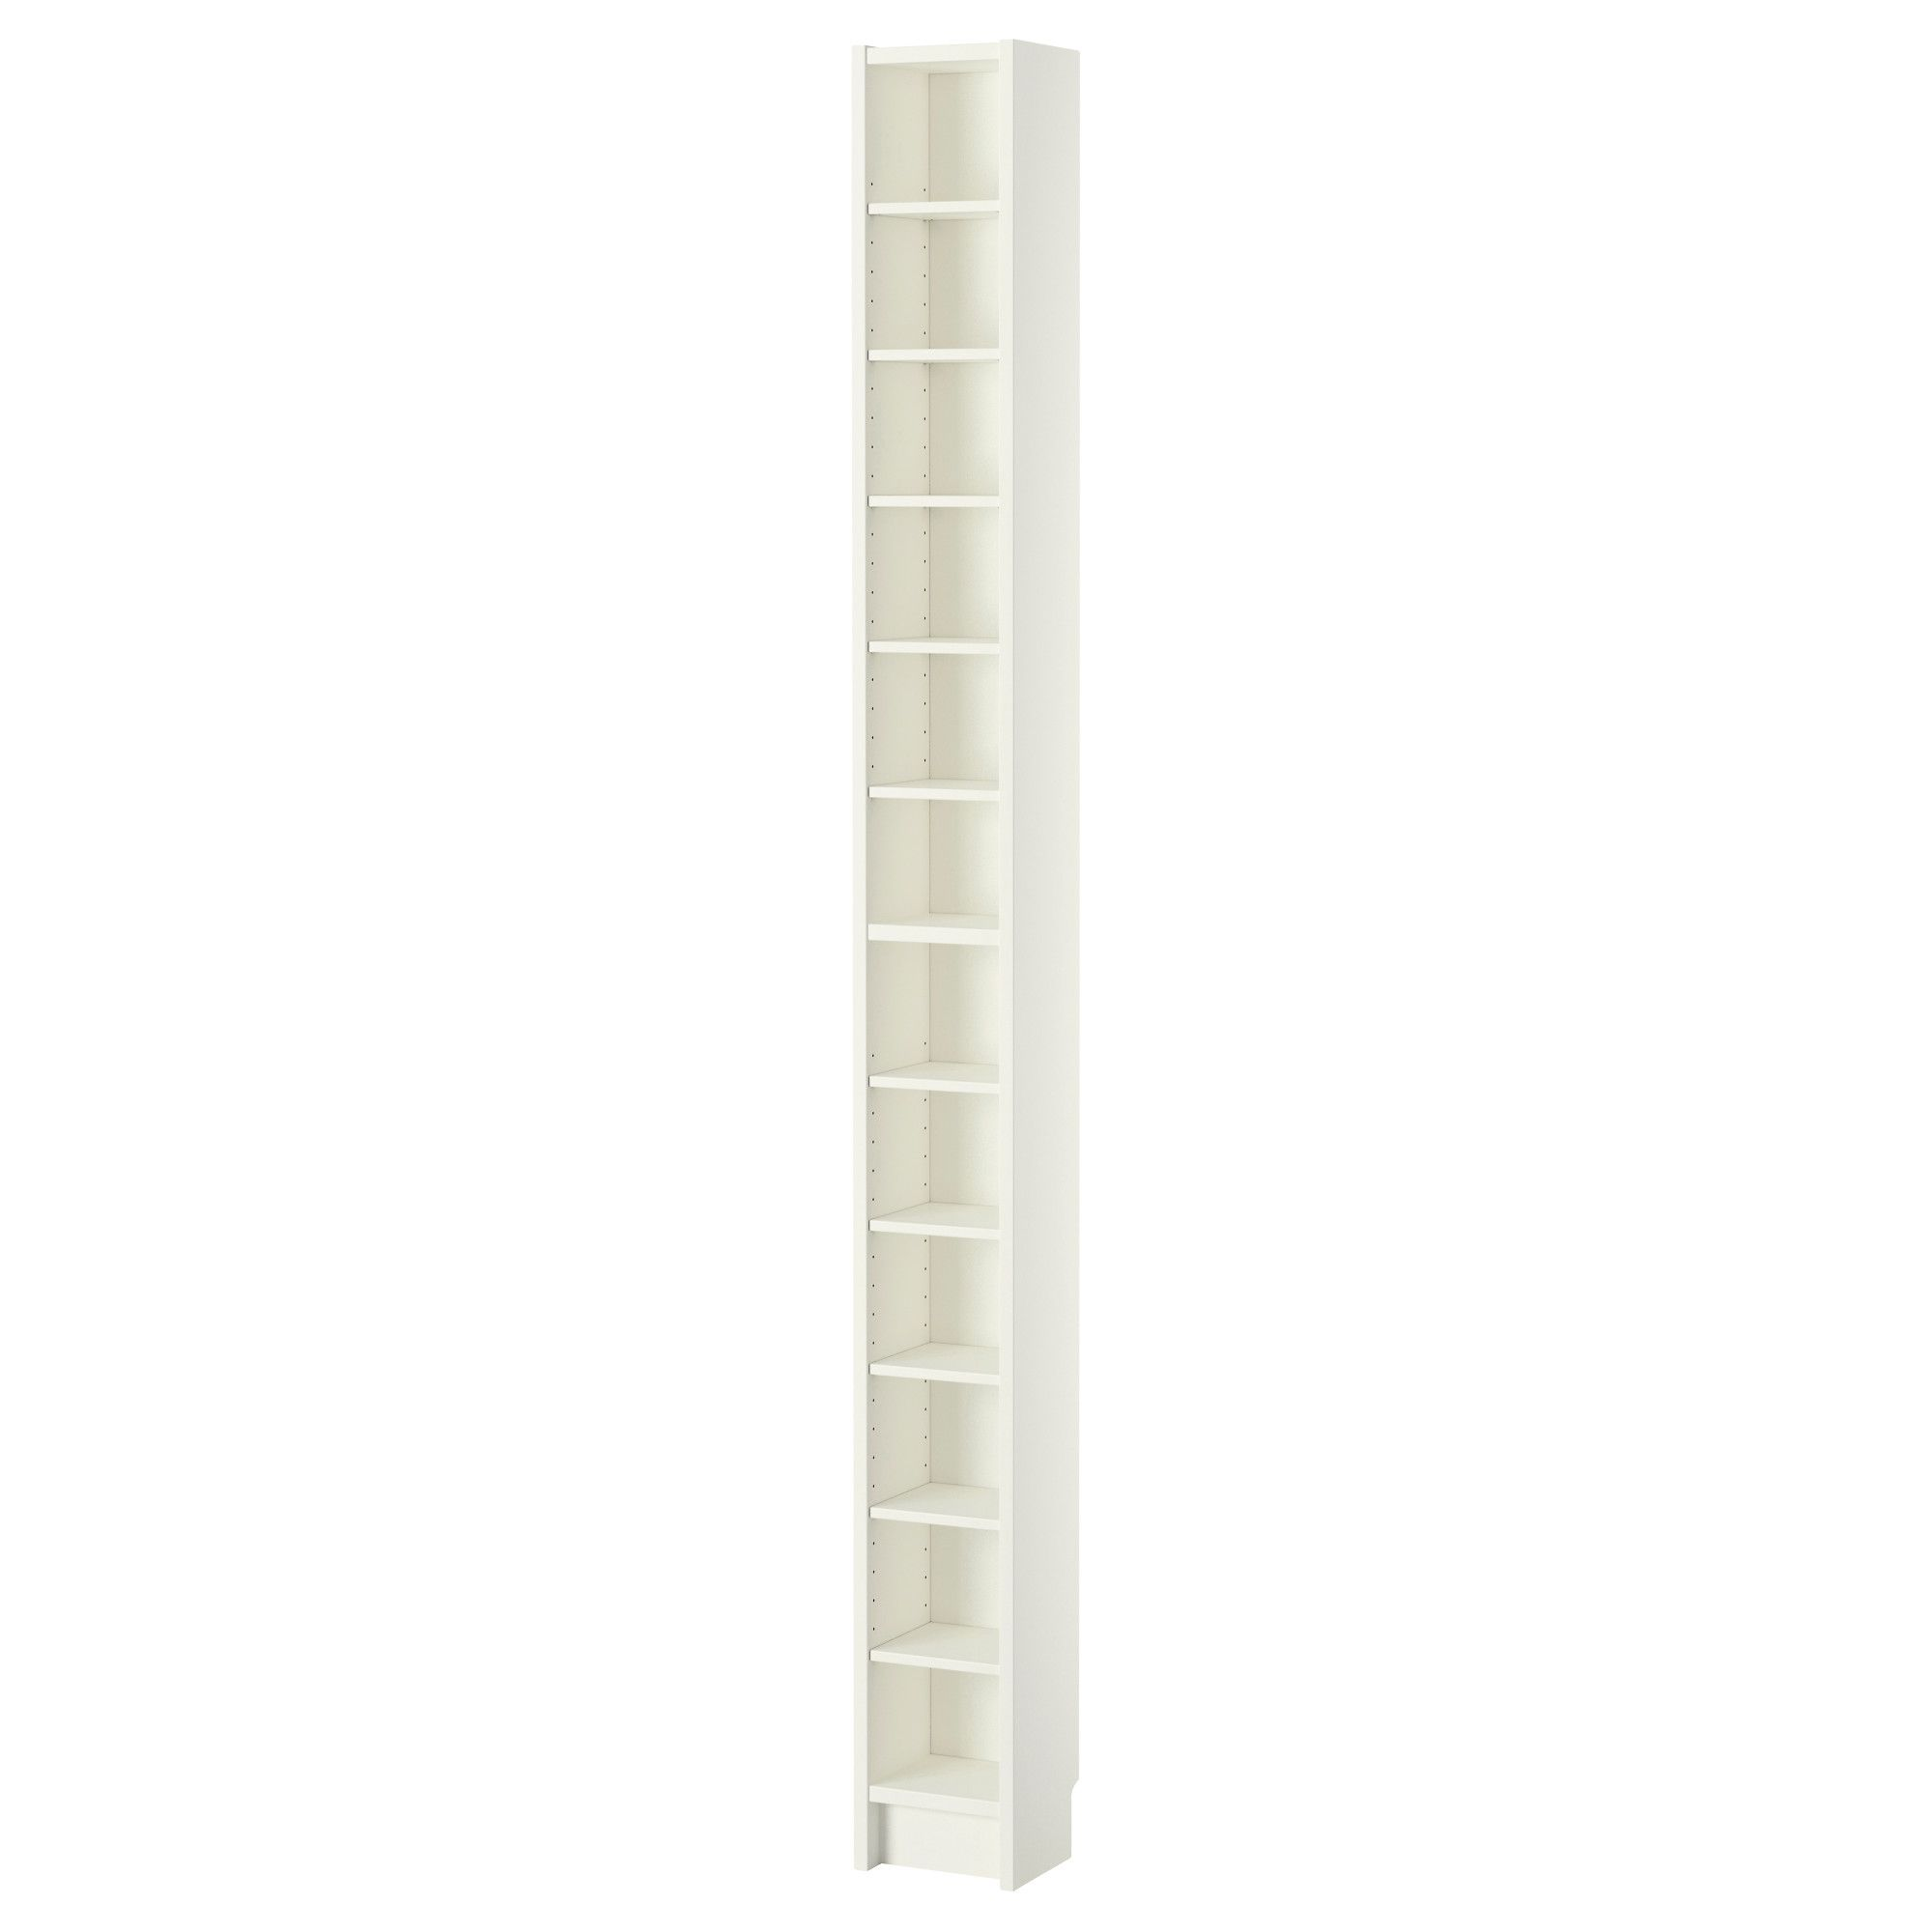 Hallway furniture gumtree  GNEDBY Shelving unit white  Shelves Cd storage and Studio ideas